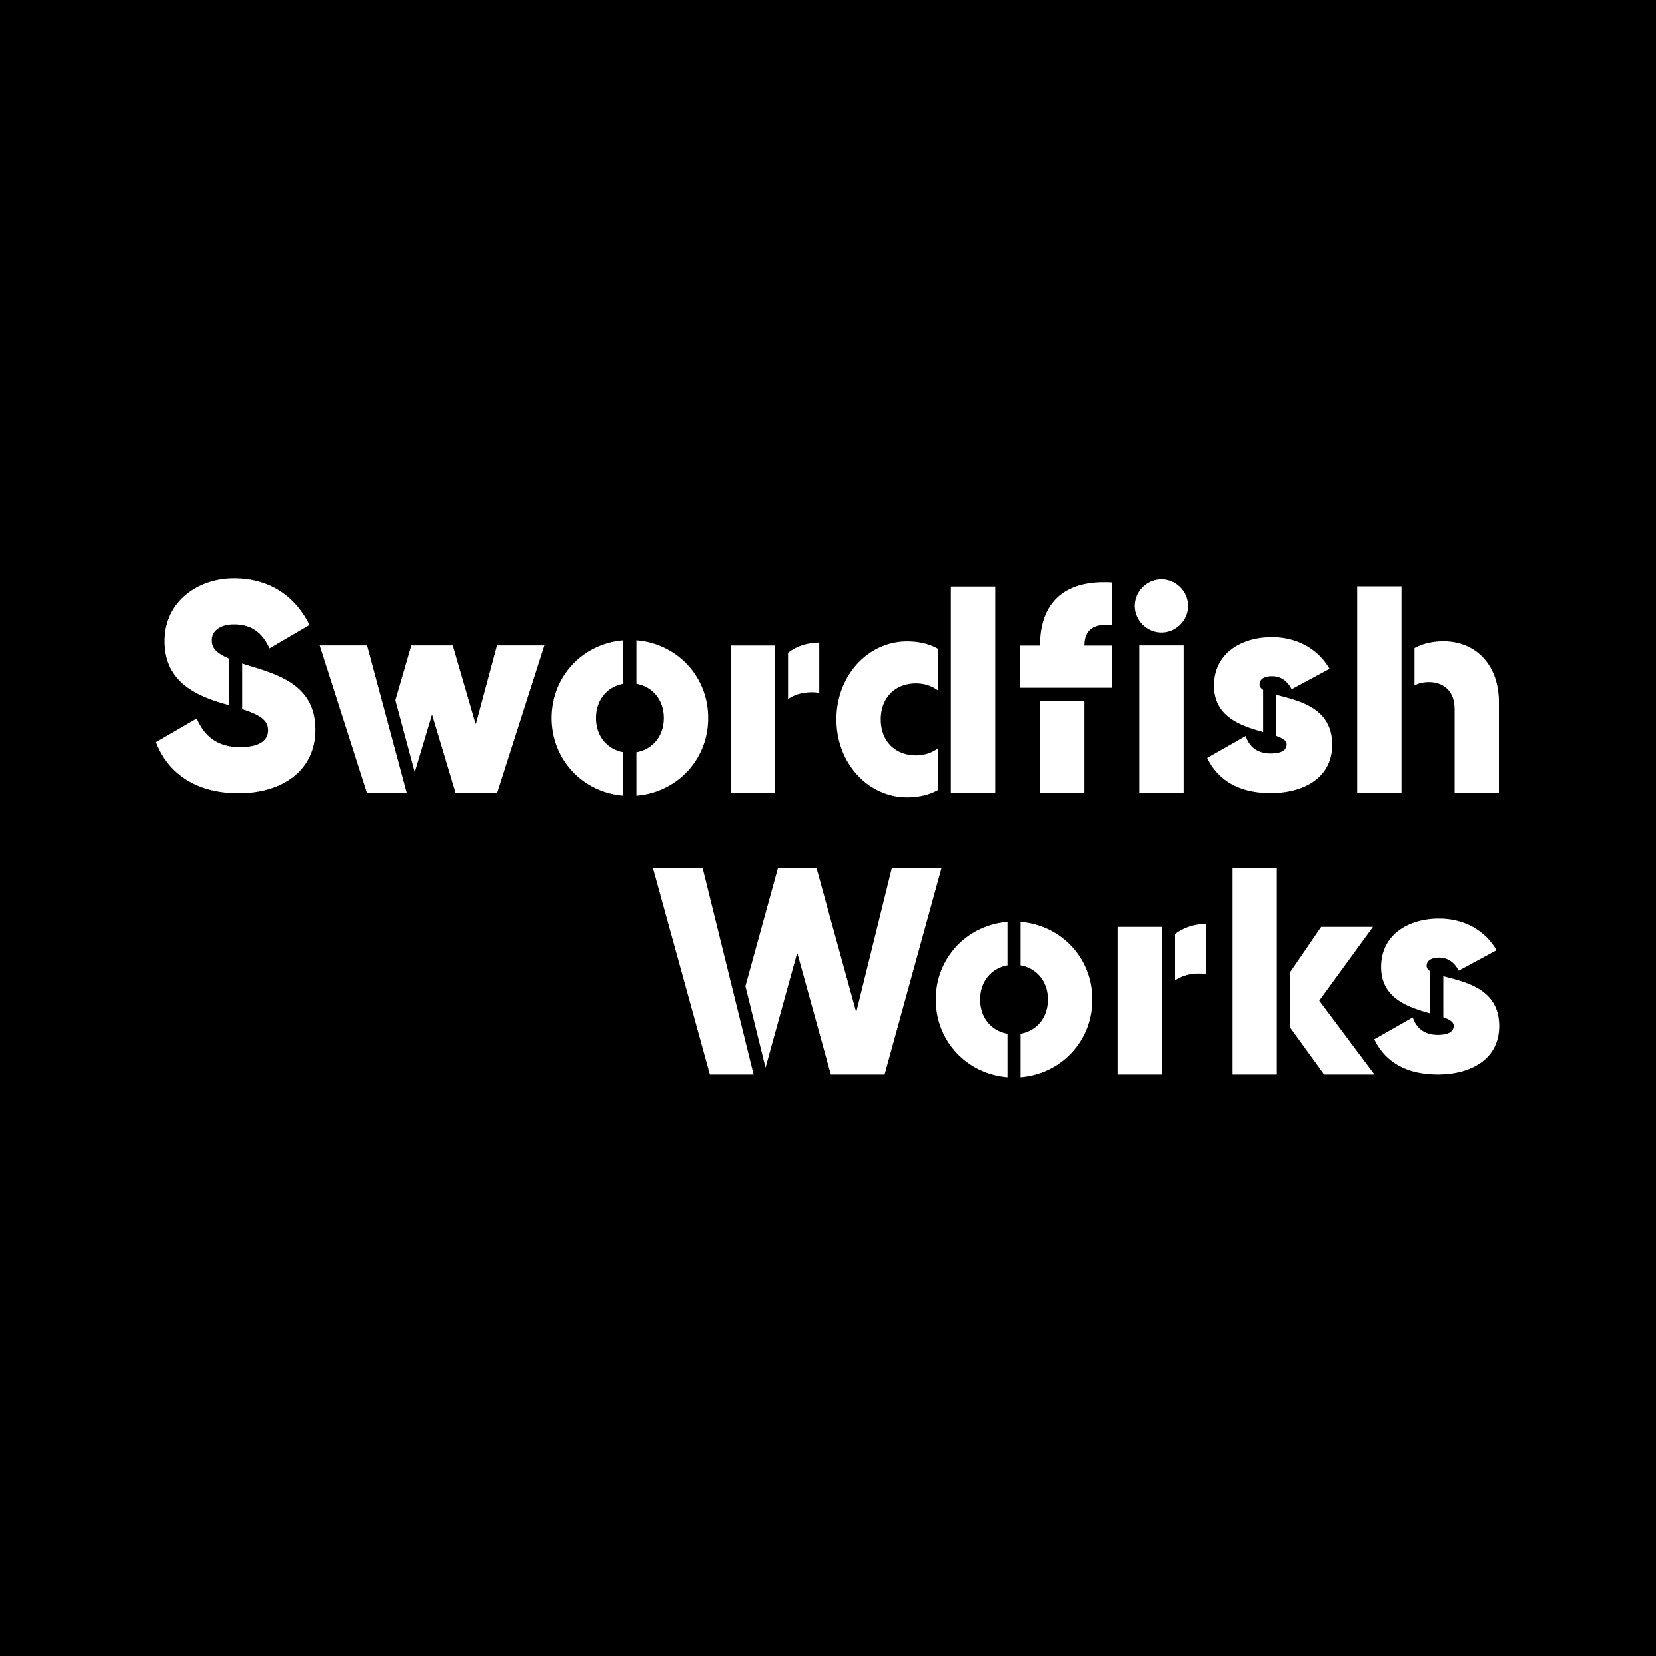 Swordfish Works on Twitter: